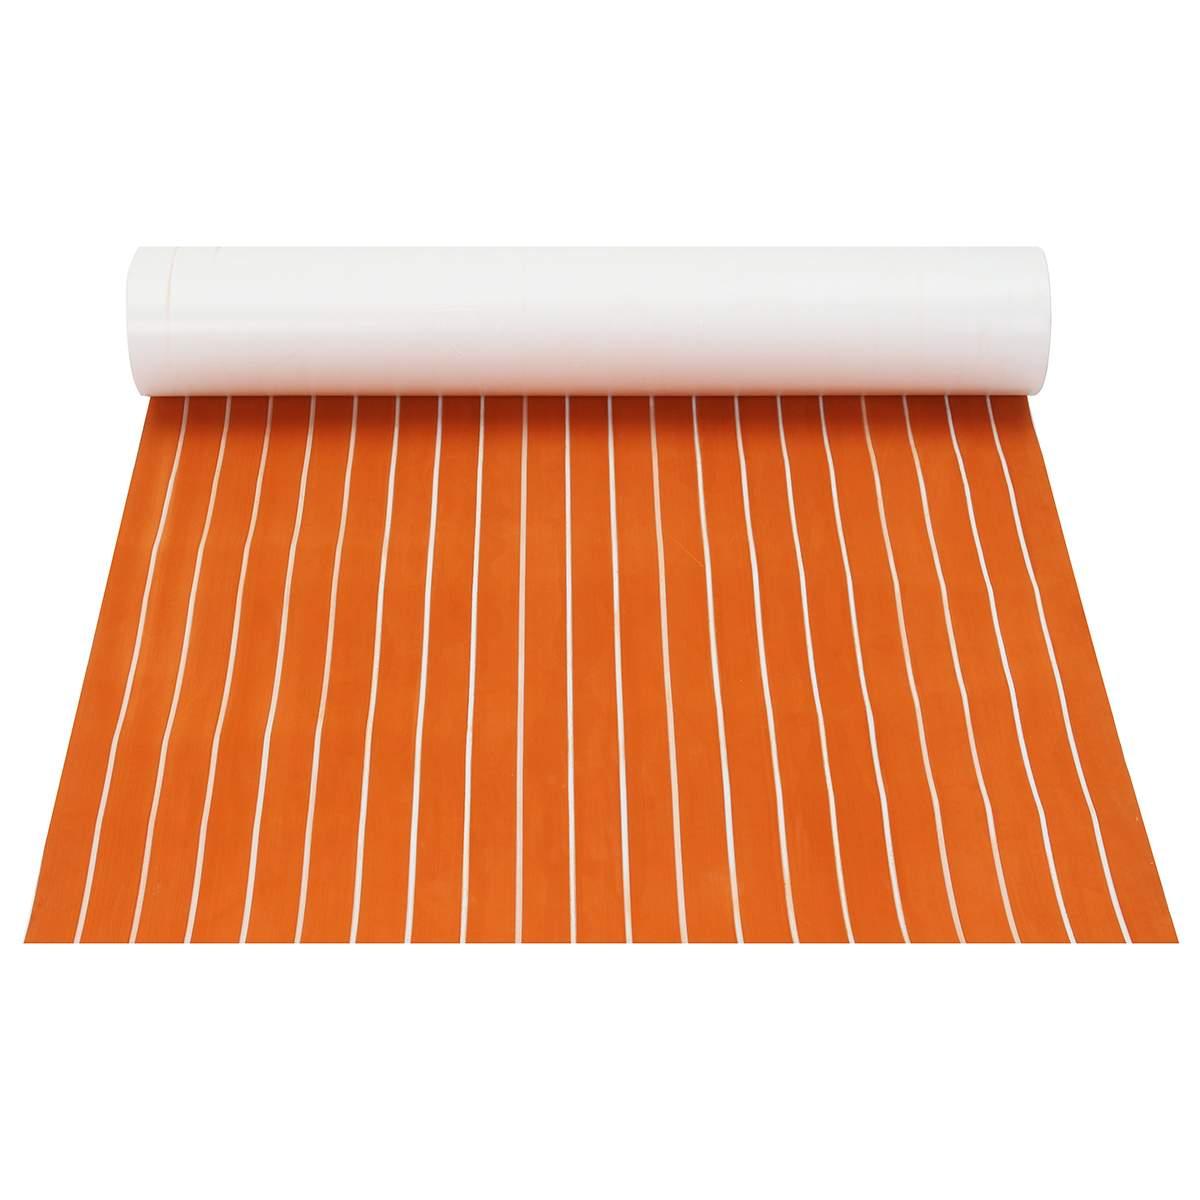 1200x2000x6mm Self-Adhesive Foam Teak Decking EVA Foam Marine Flooring Faux Boat Decking Sheet Marine Orange White Line1200x2000x6mm Self-Adhesive Foam Teak Decking EVA Foam Marine Flooring Faux Boat Decking Sheet Marine Orange White Line